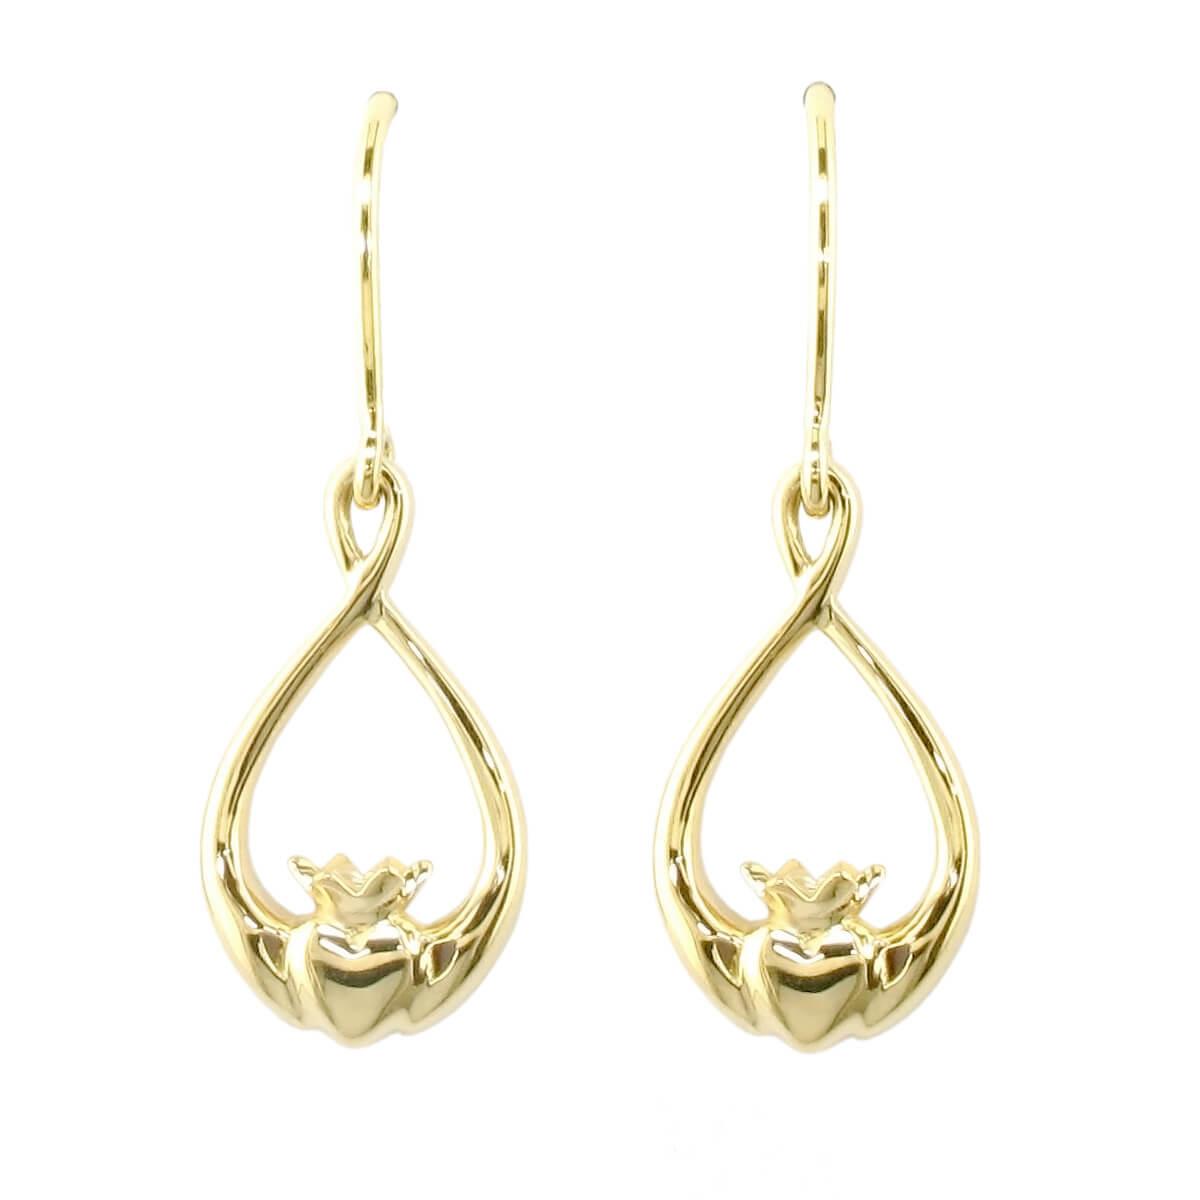 Faller Claddagh, 18ct yellow gold, Irish, love, loyalty & friendship, hands, heart & crown, drop earrings, ladies